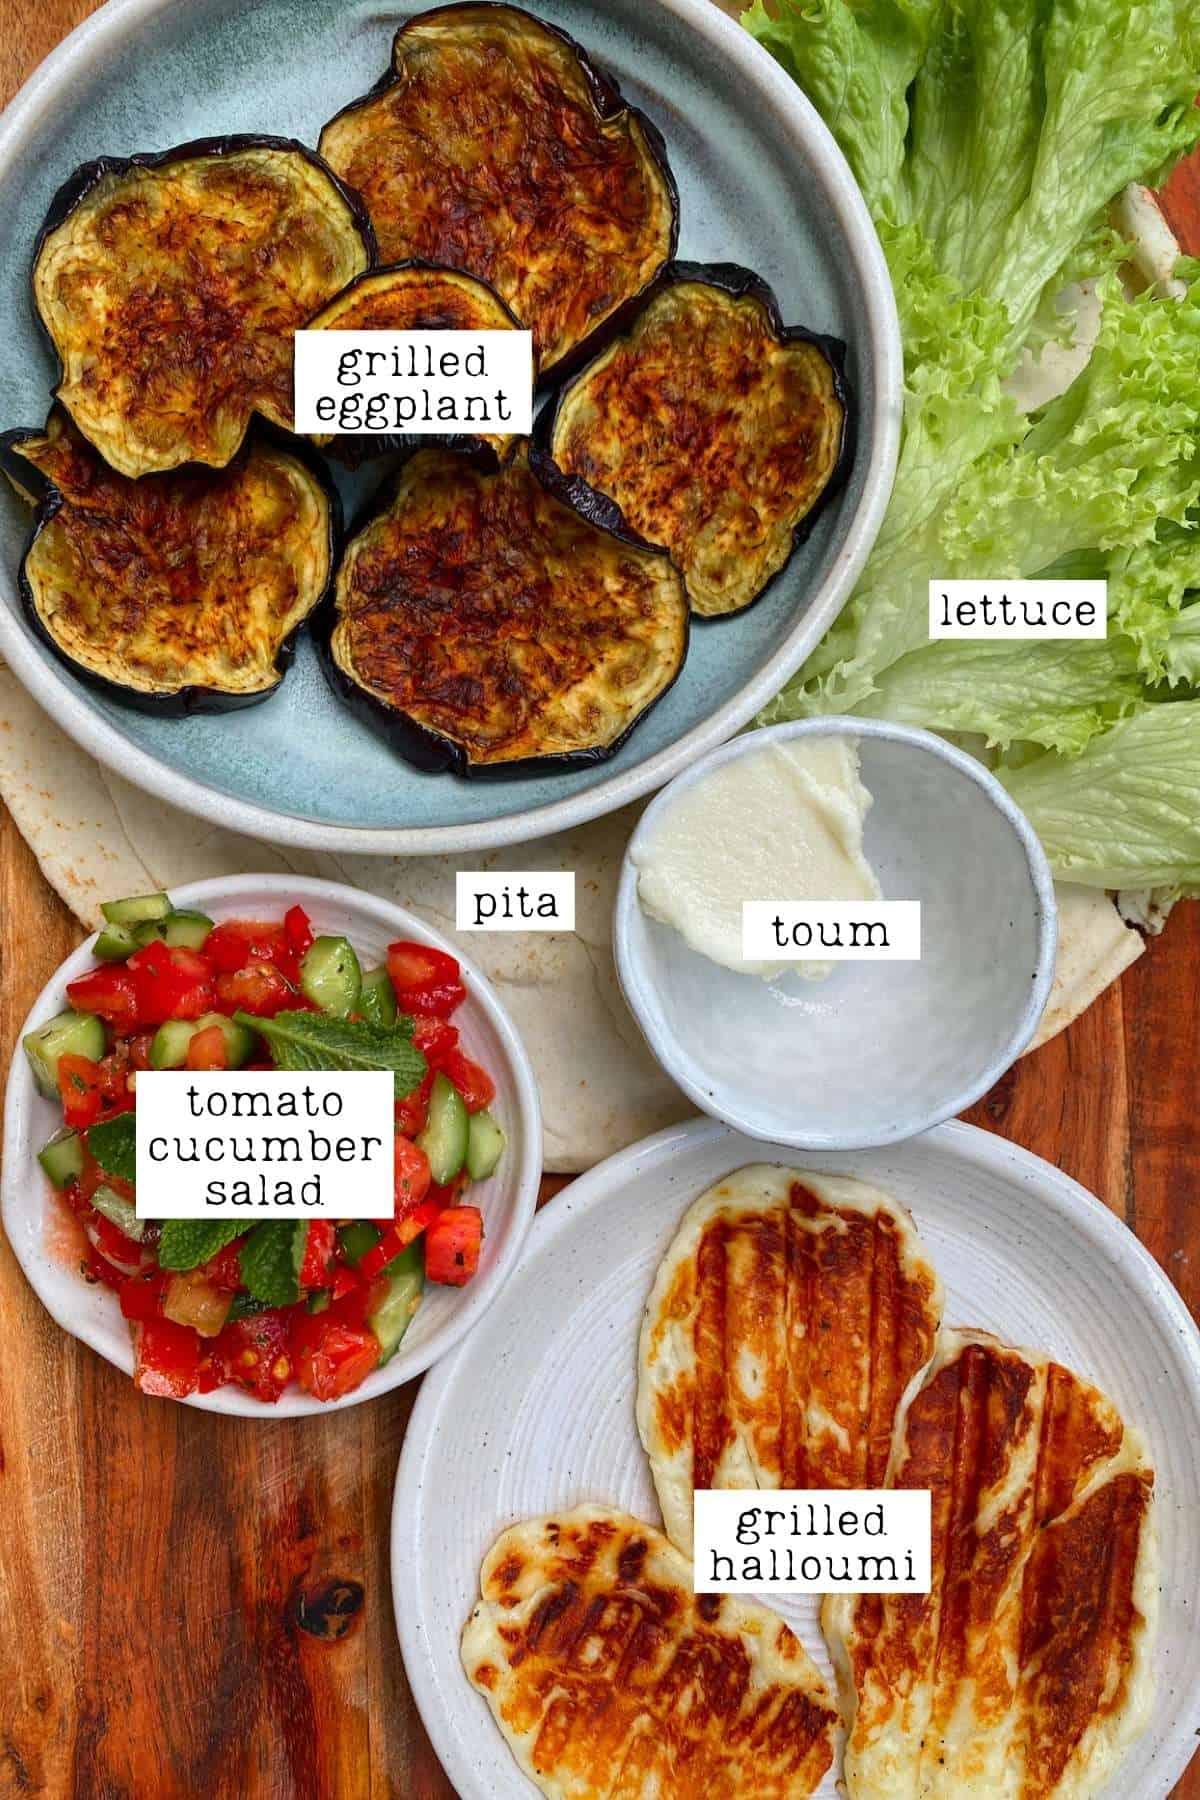 Ingredients for eggplant halloumi wrap